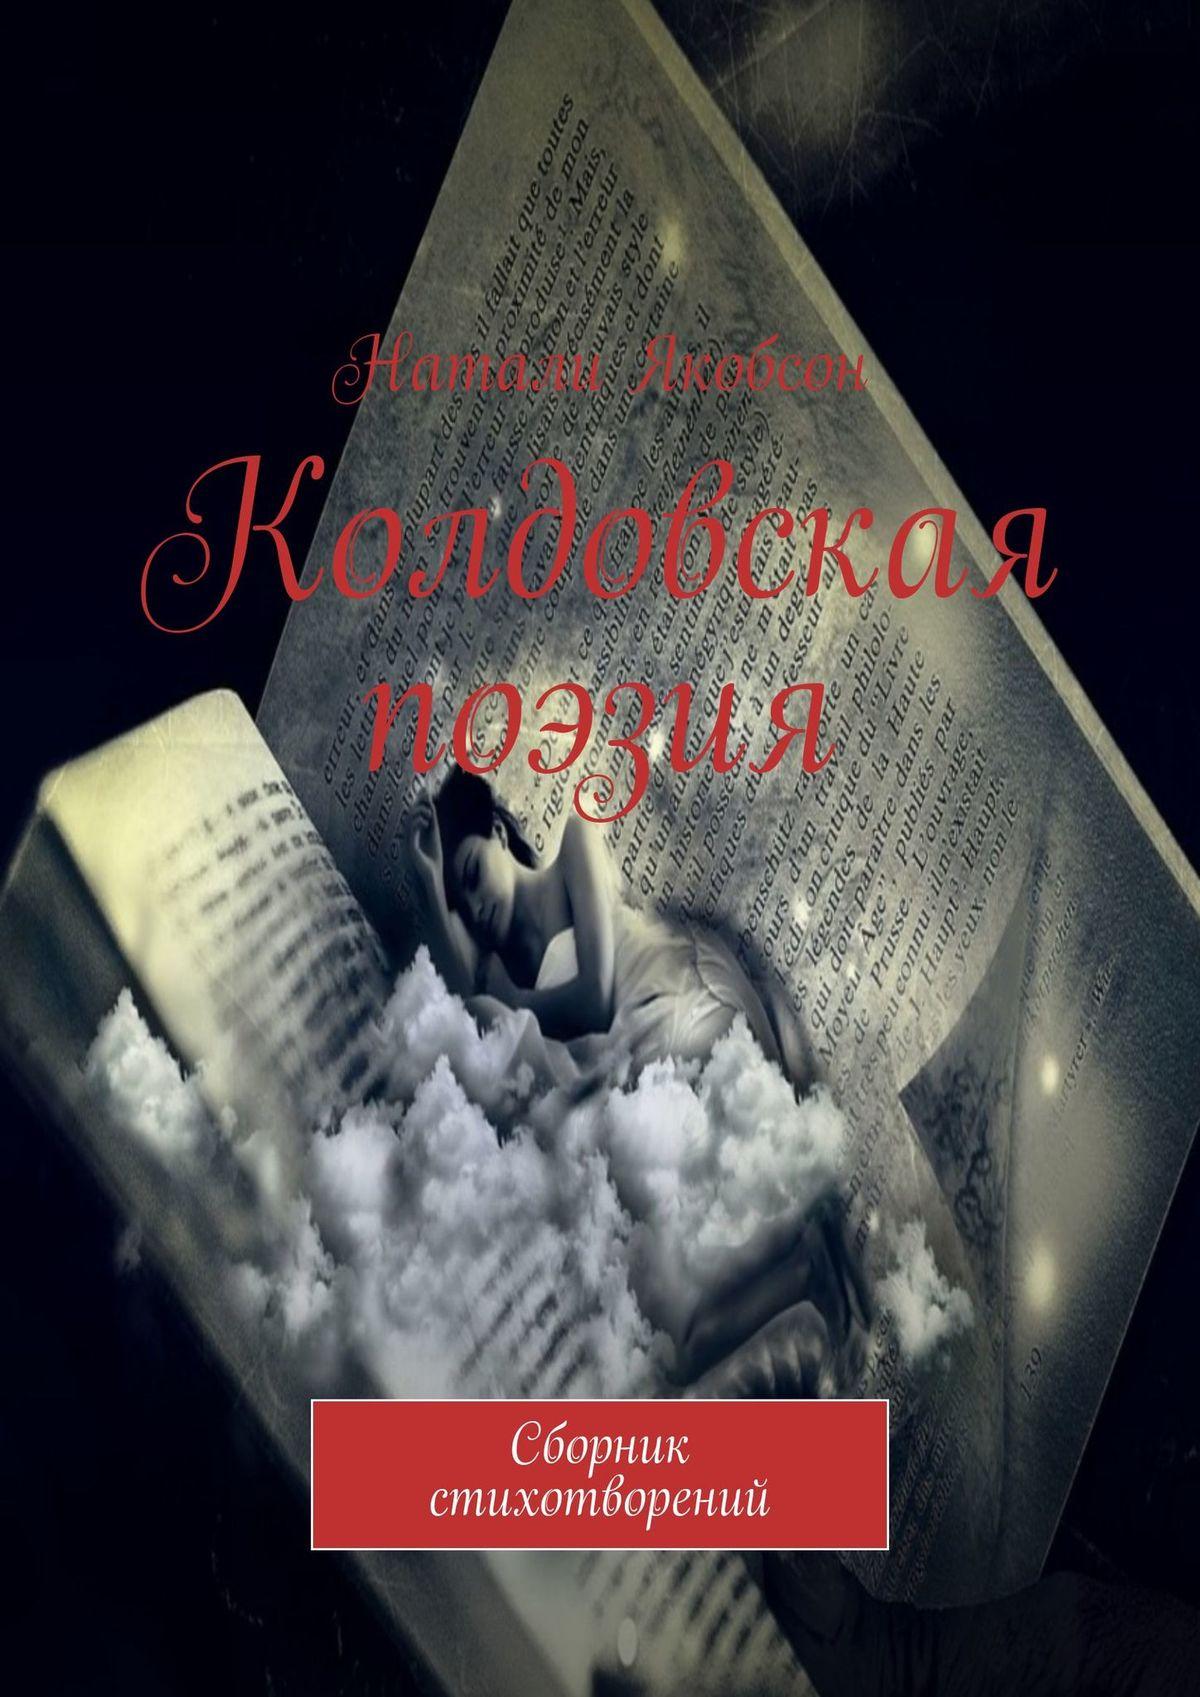 все цены на Натали Якобсон Колдовская поэзия. Сборник стихотворений онлайн